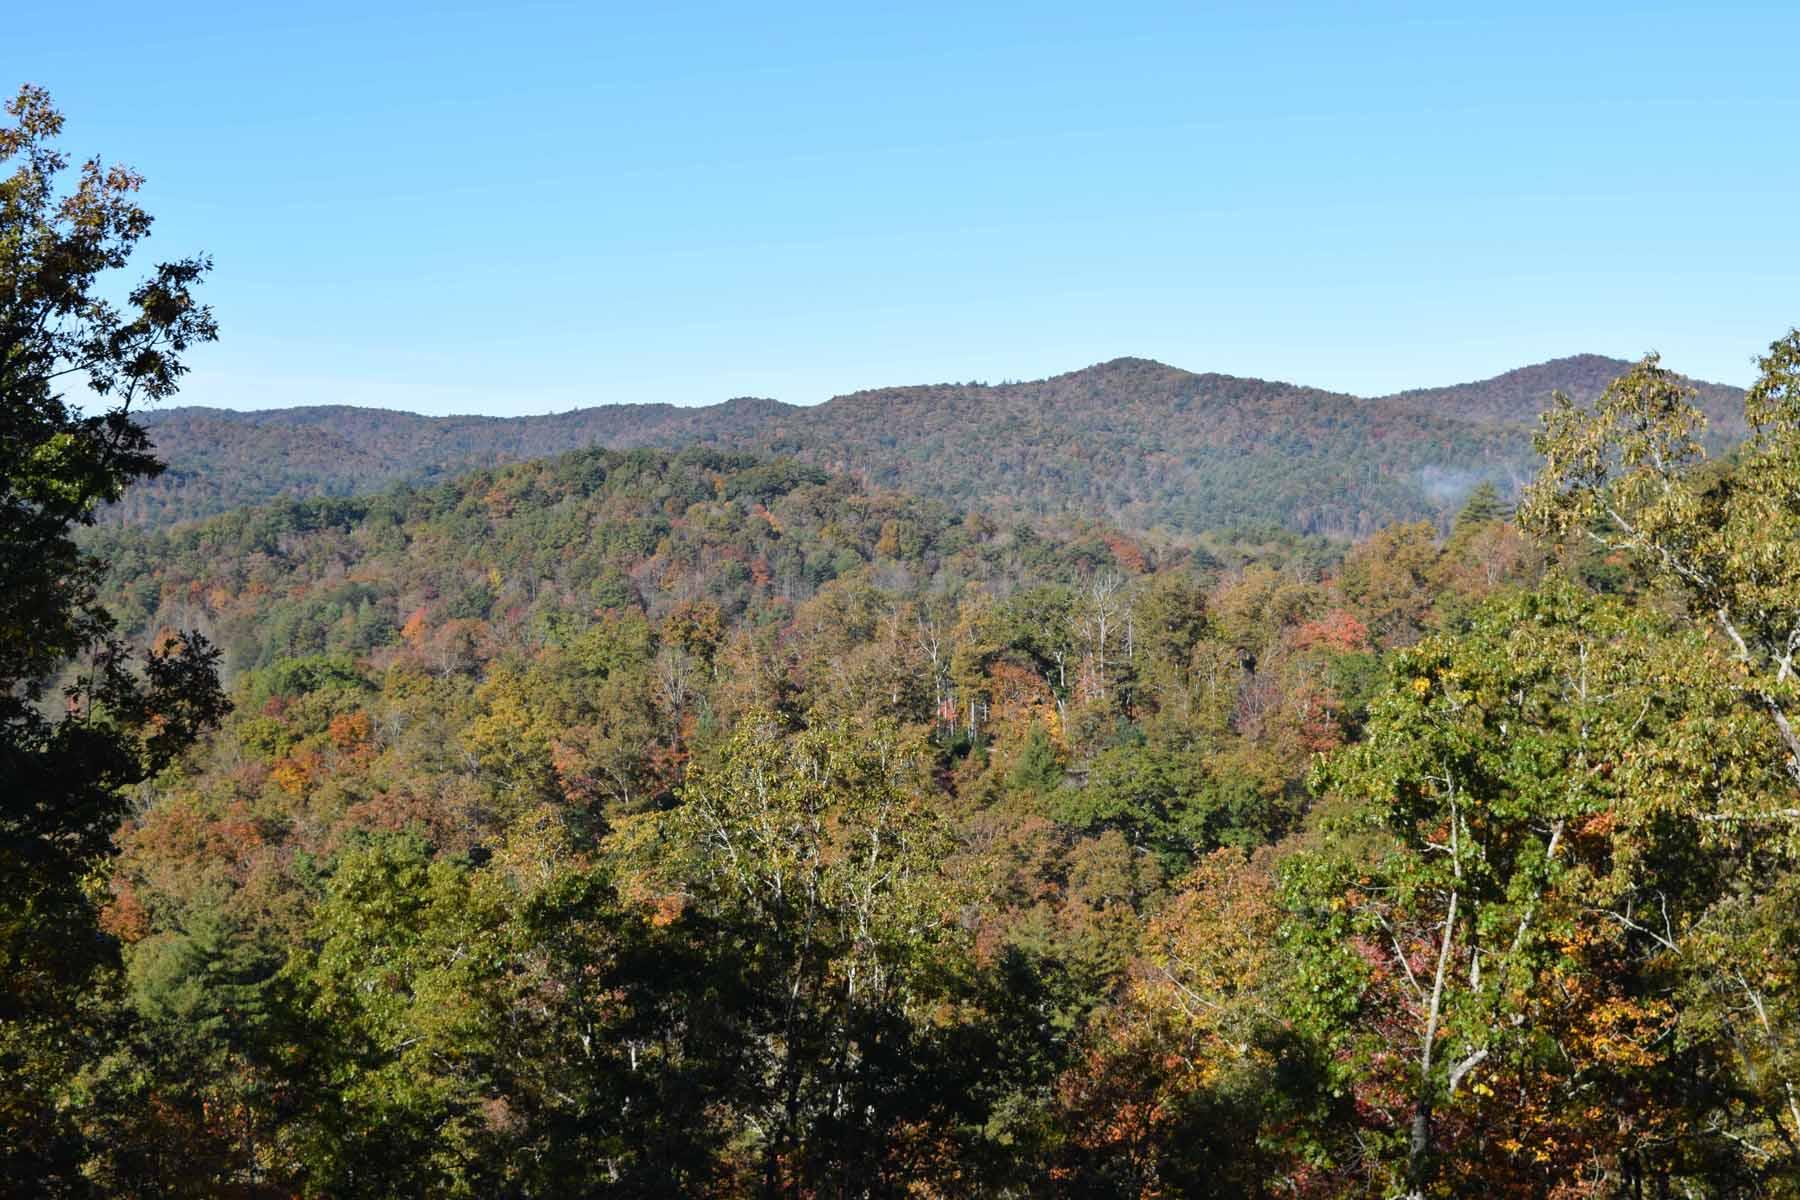 独户住宅 为 销售 在 Upscale, Eco-Friendly Mountainside Cottage 0 Canaan Valley Road Lot A Suches, 乔治亚州, 30572 美国